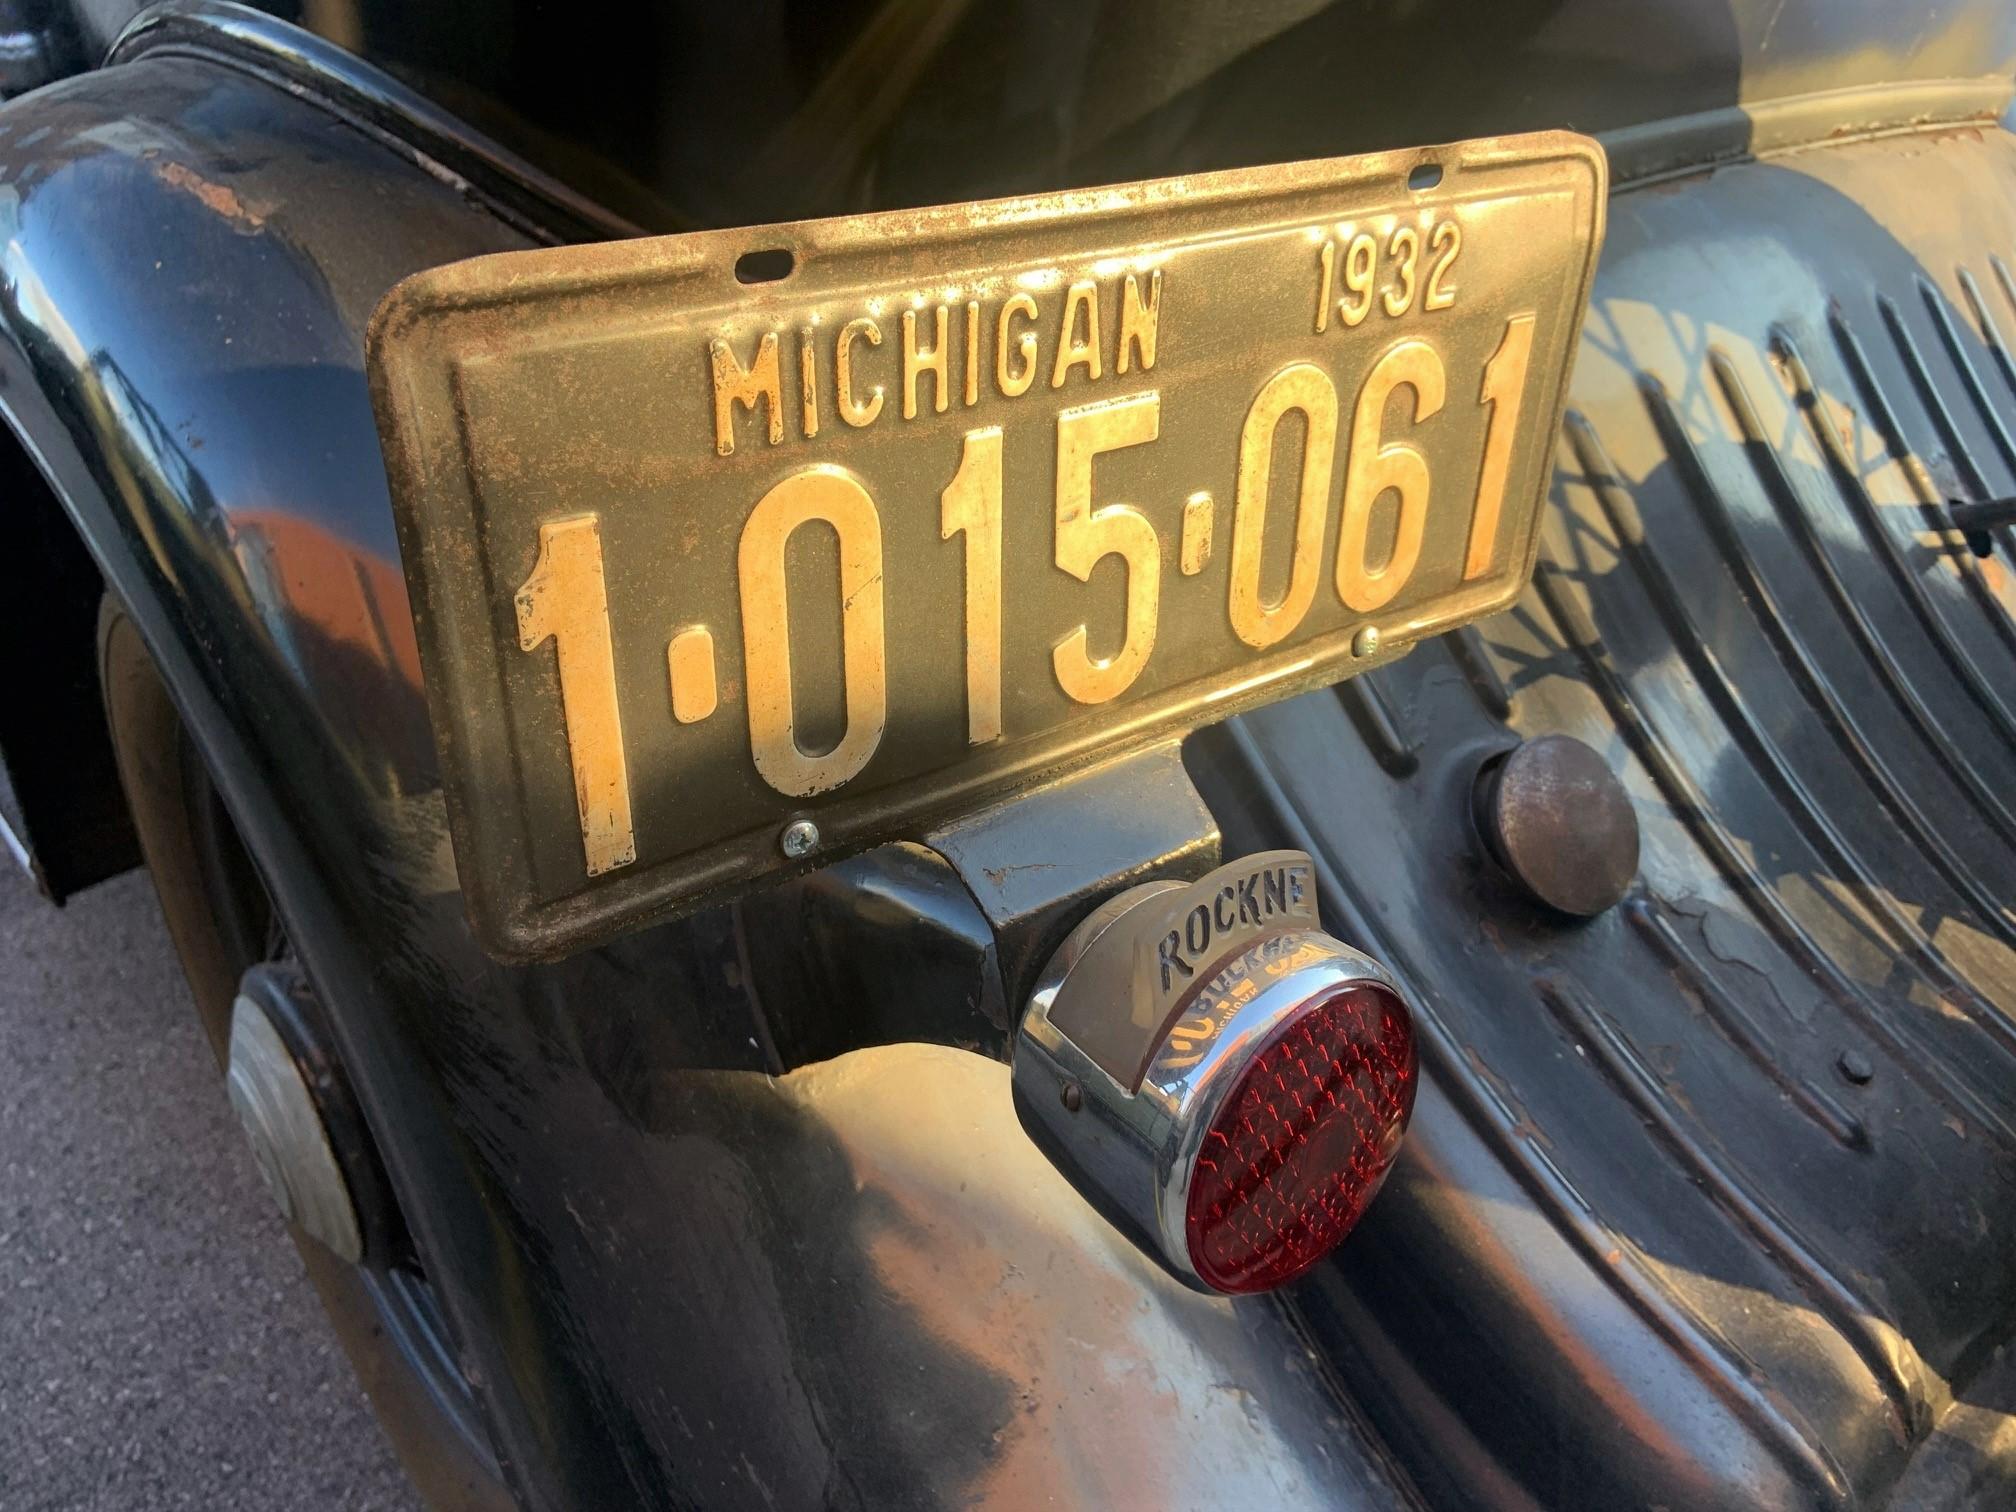 1932 Rockne - rear license plate